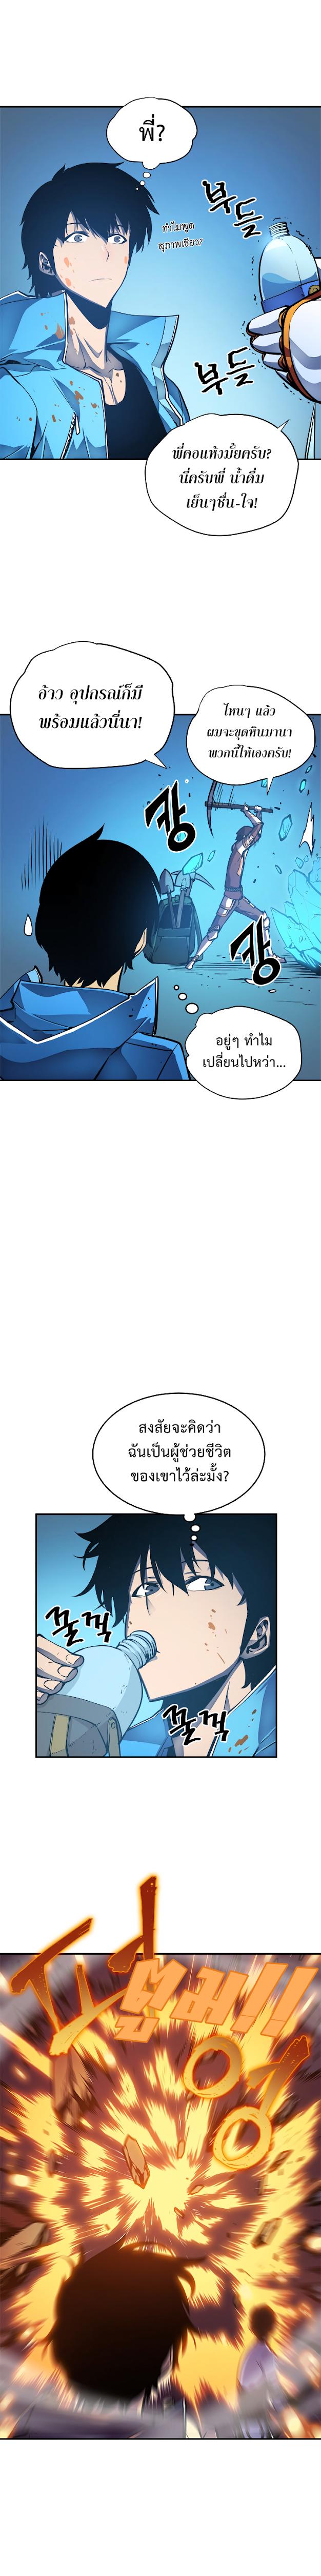 Solo Leveling ตอนที่ 22 TH แปลไทย